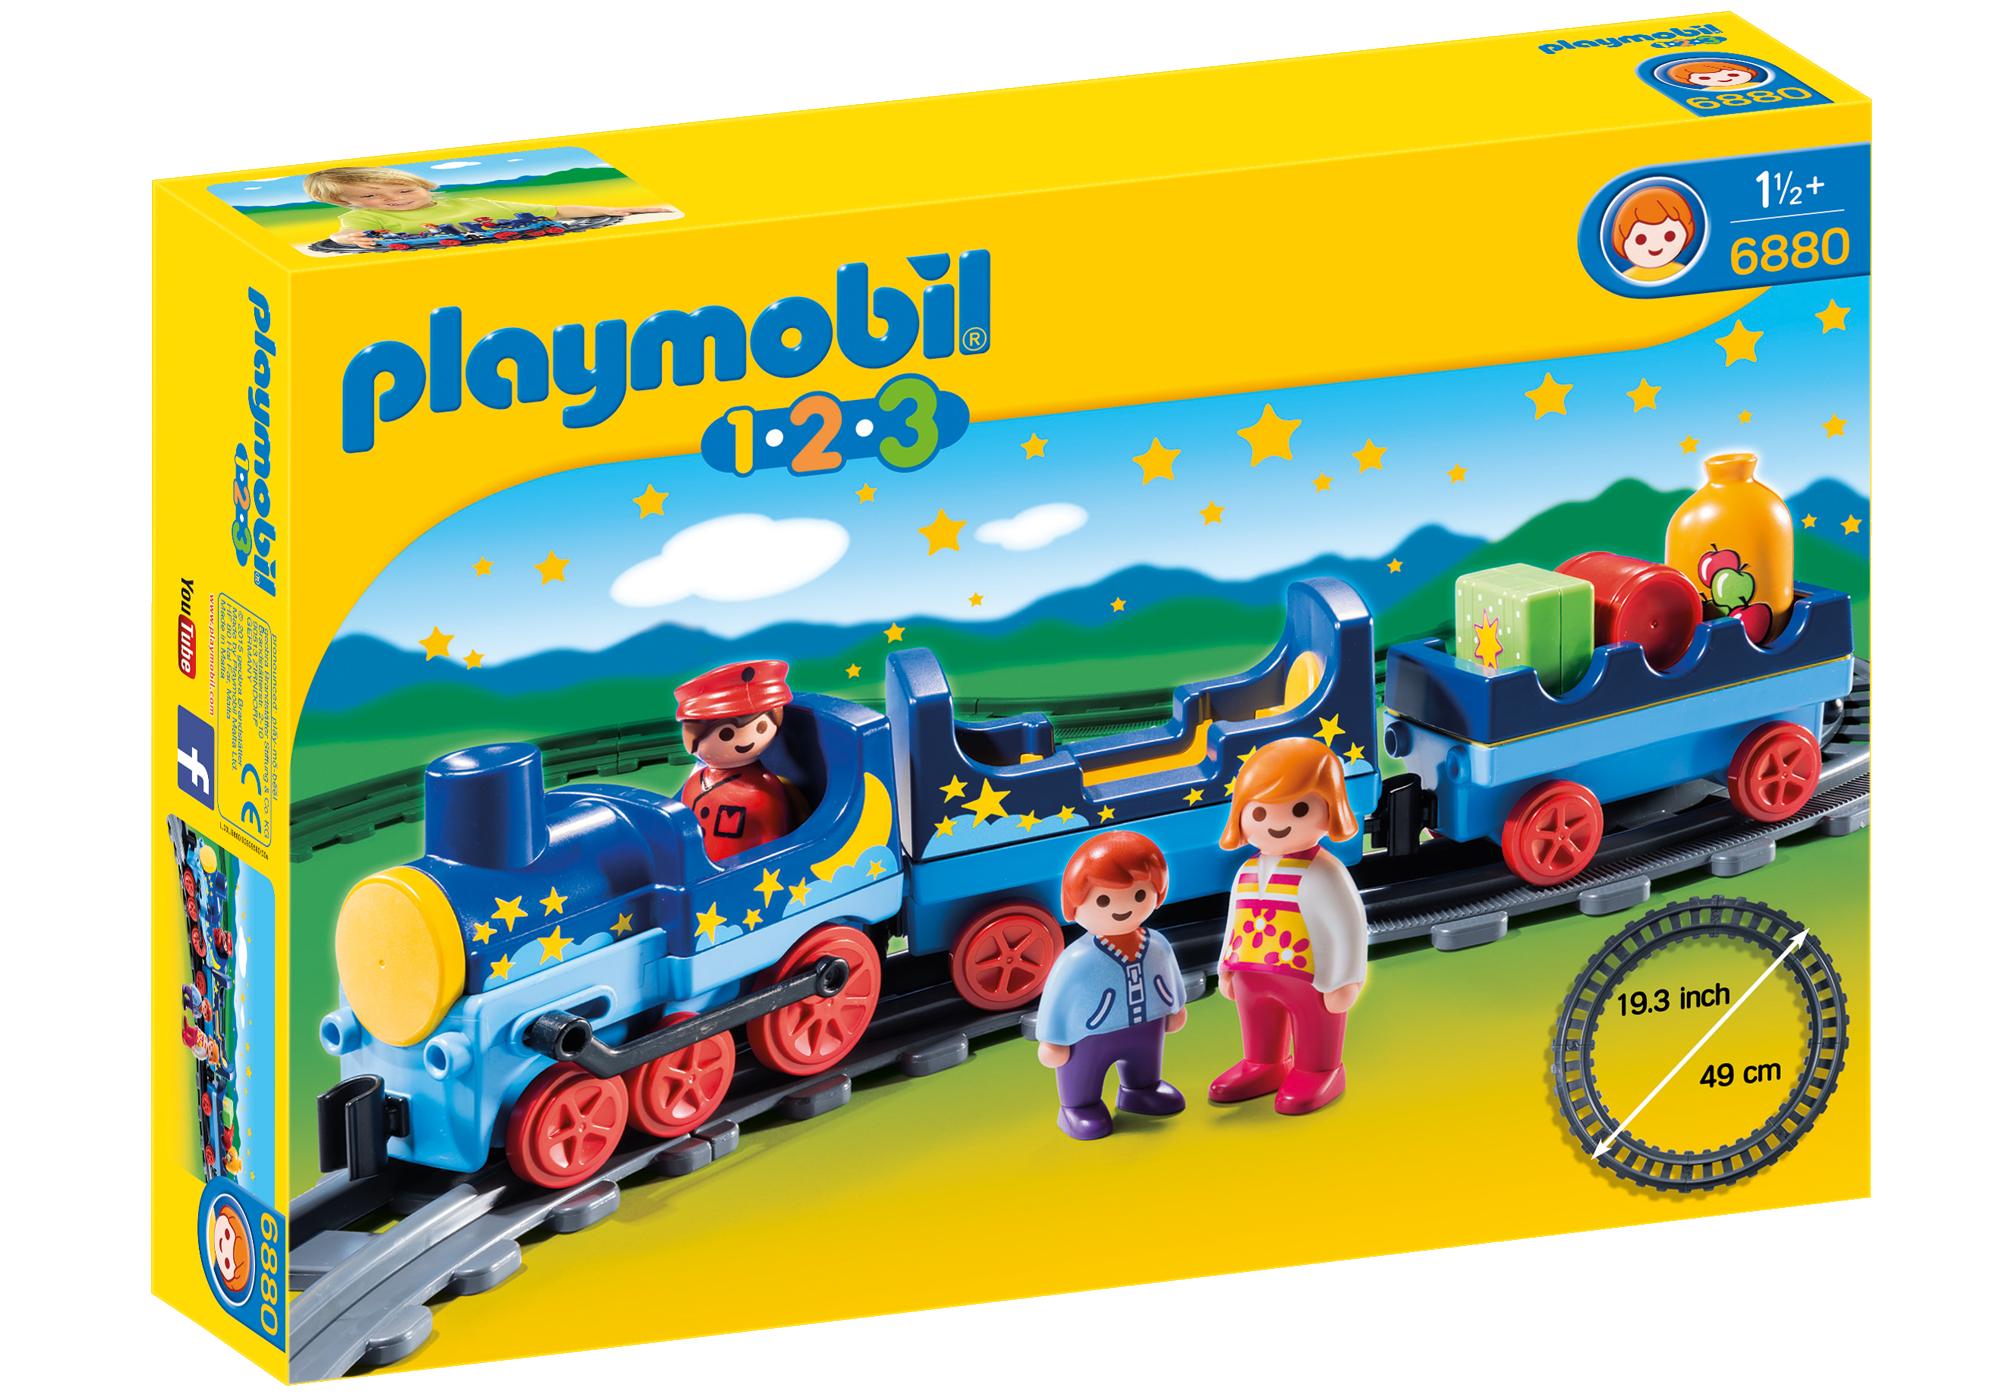 http://media.playmobil.com/i/playmobil/6880_product_box_front